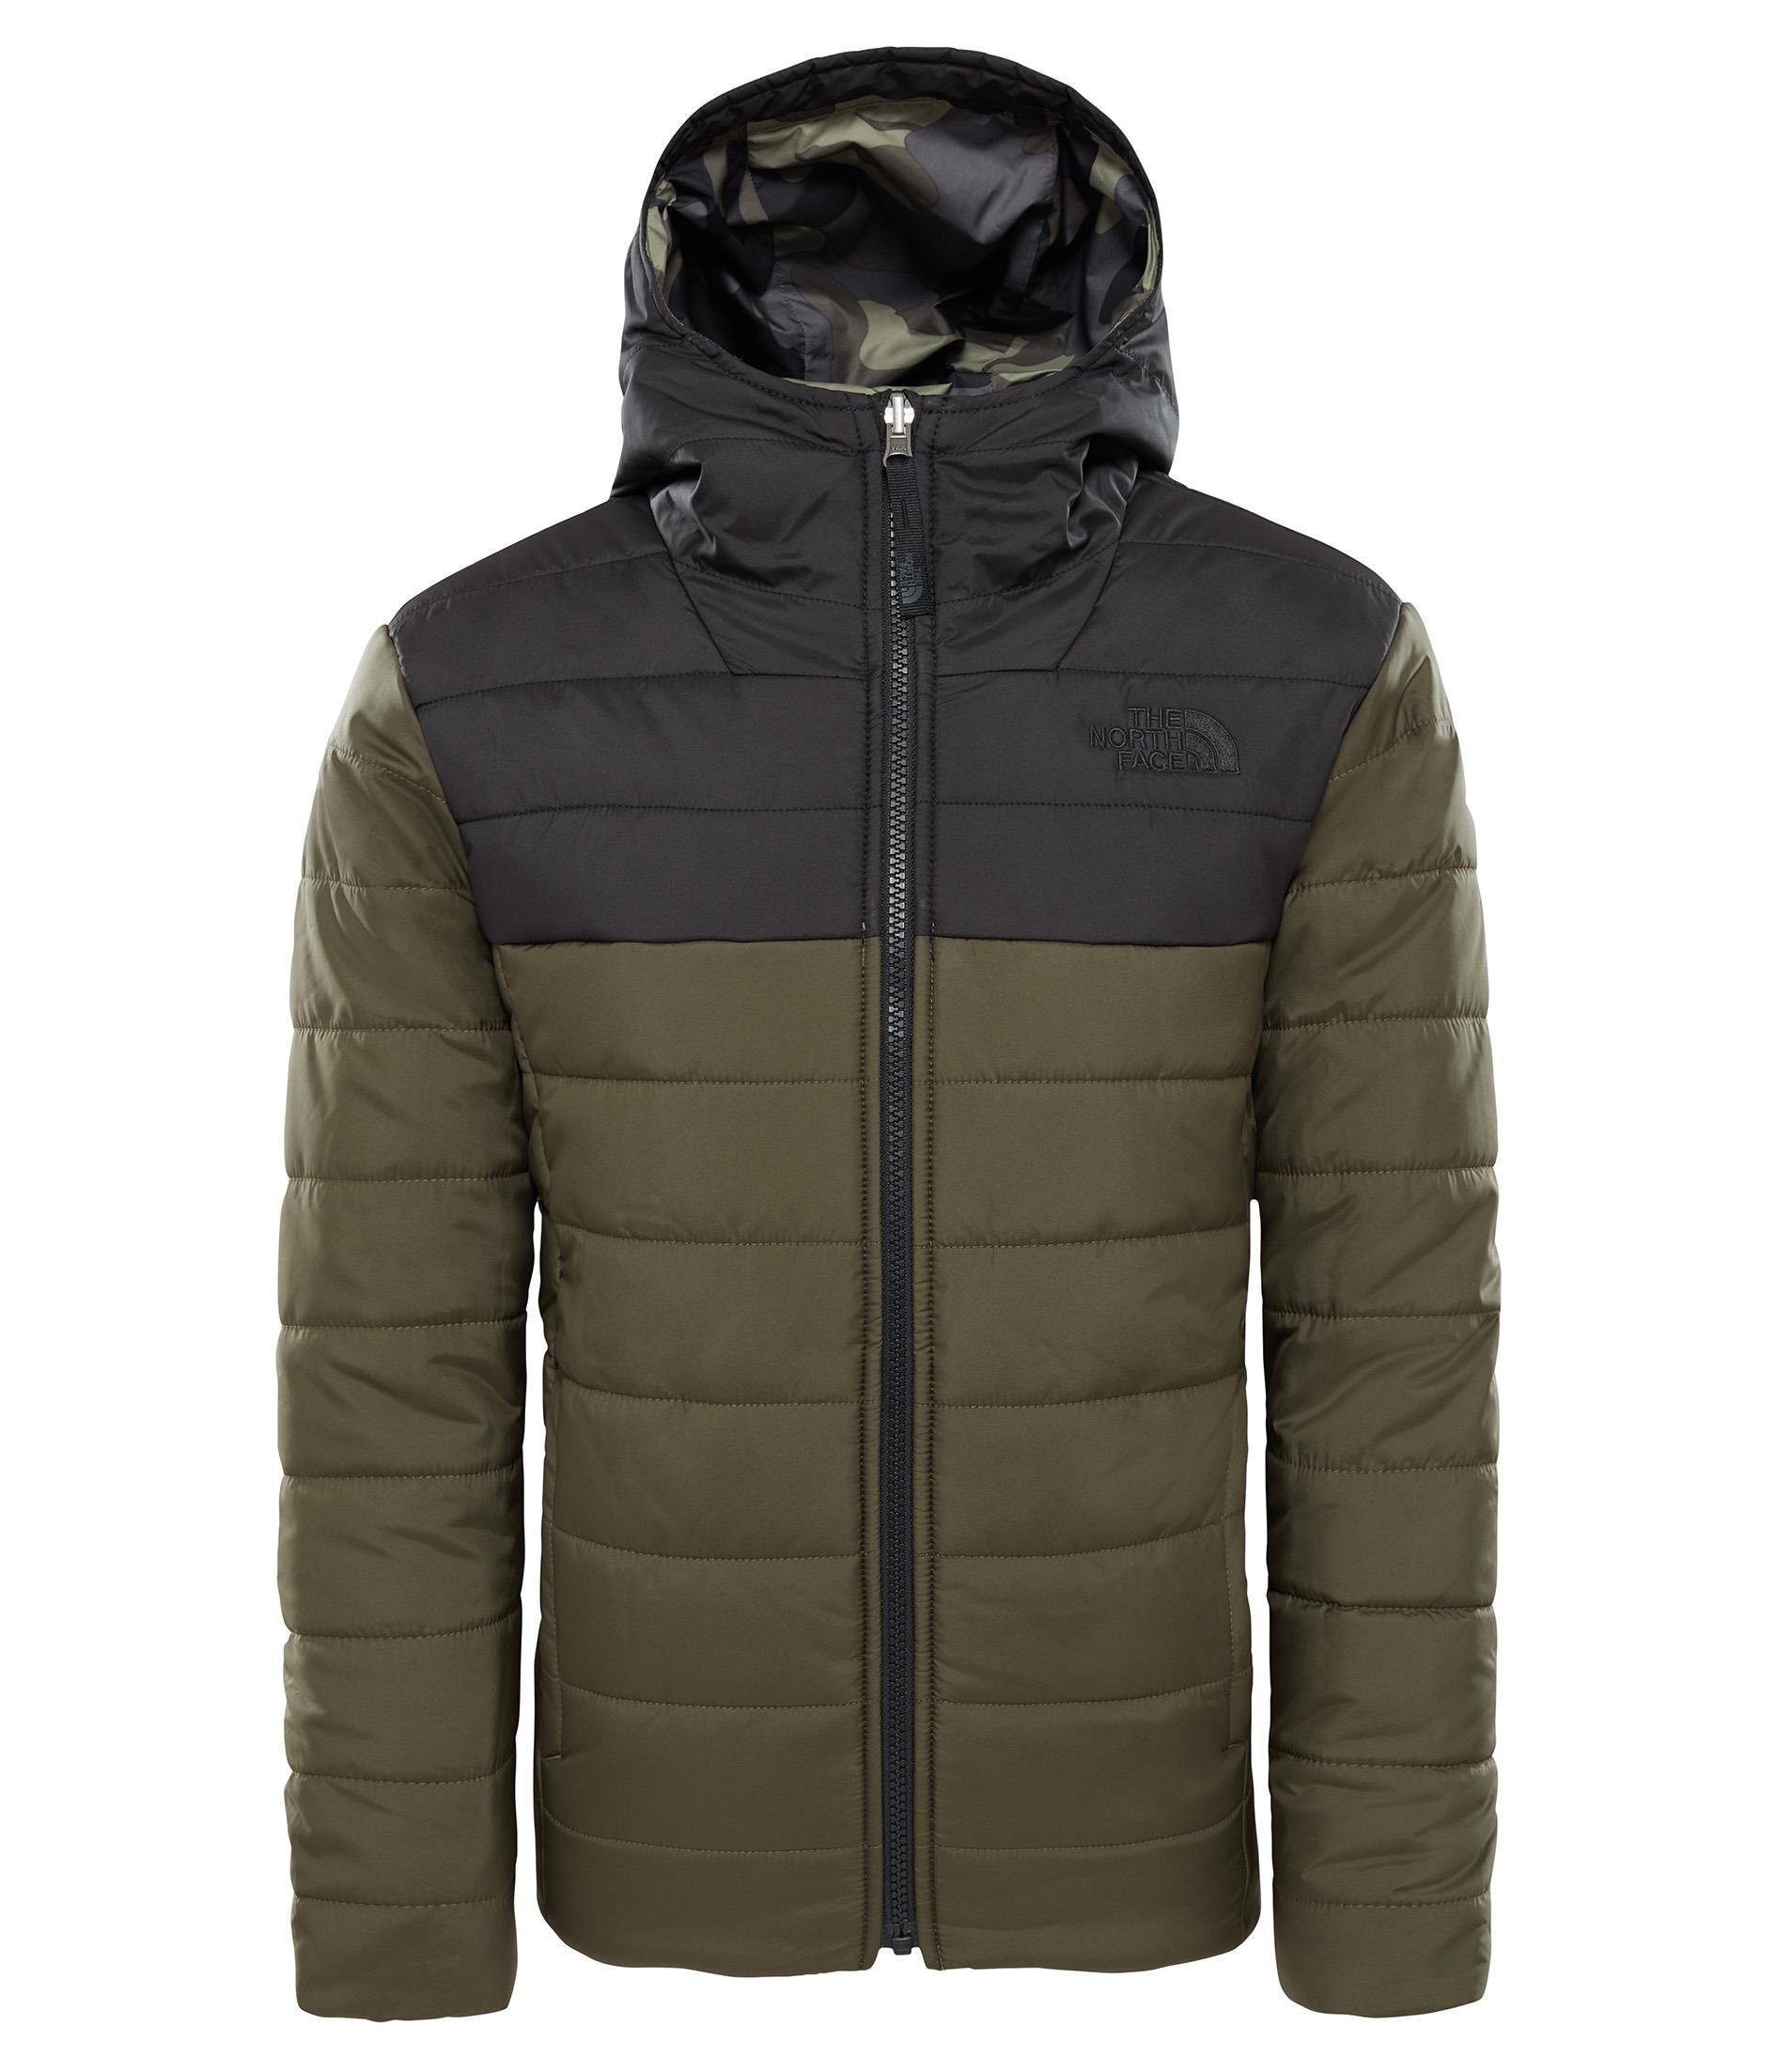 The North Face Çift Taraflı Giyilen Perrito Çocuk Ceket T93CQ221L